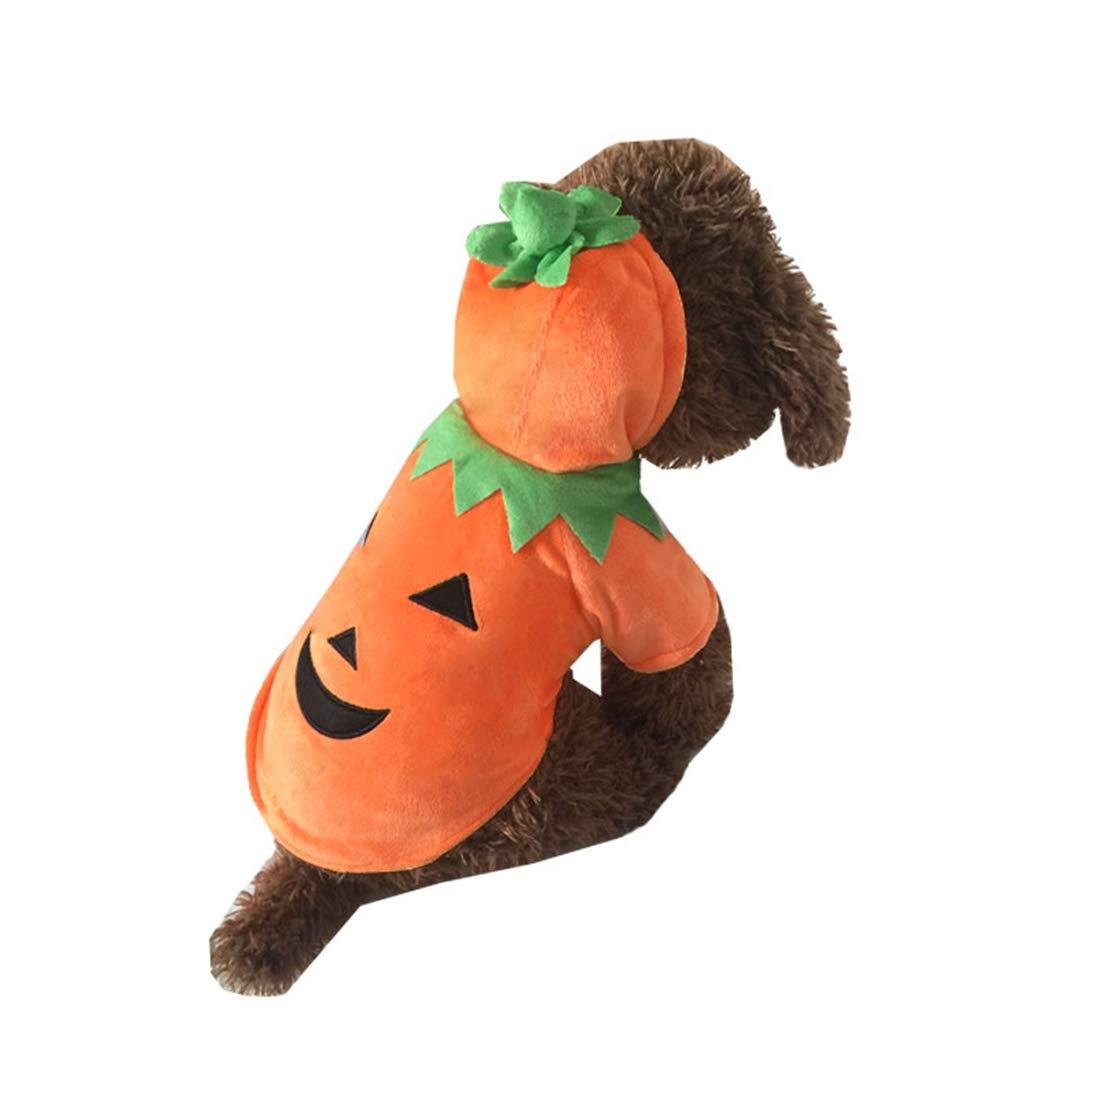 orange XS orange XS AUSWIEI Pet Clothes Halloween Big Dog Clothes Pumpkin Dress Cosplay Large Dog Clothes (color   orange, Size   XS)